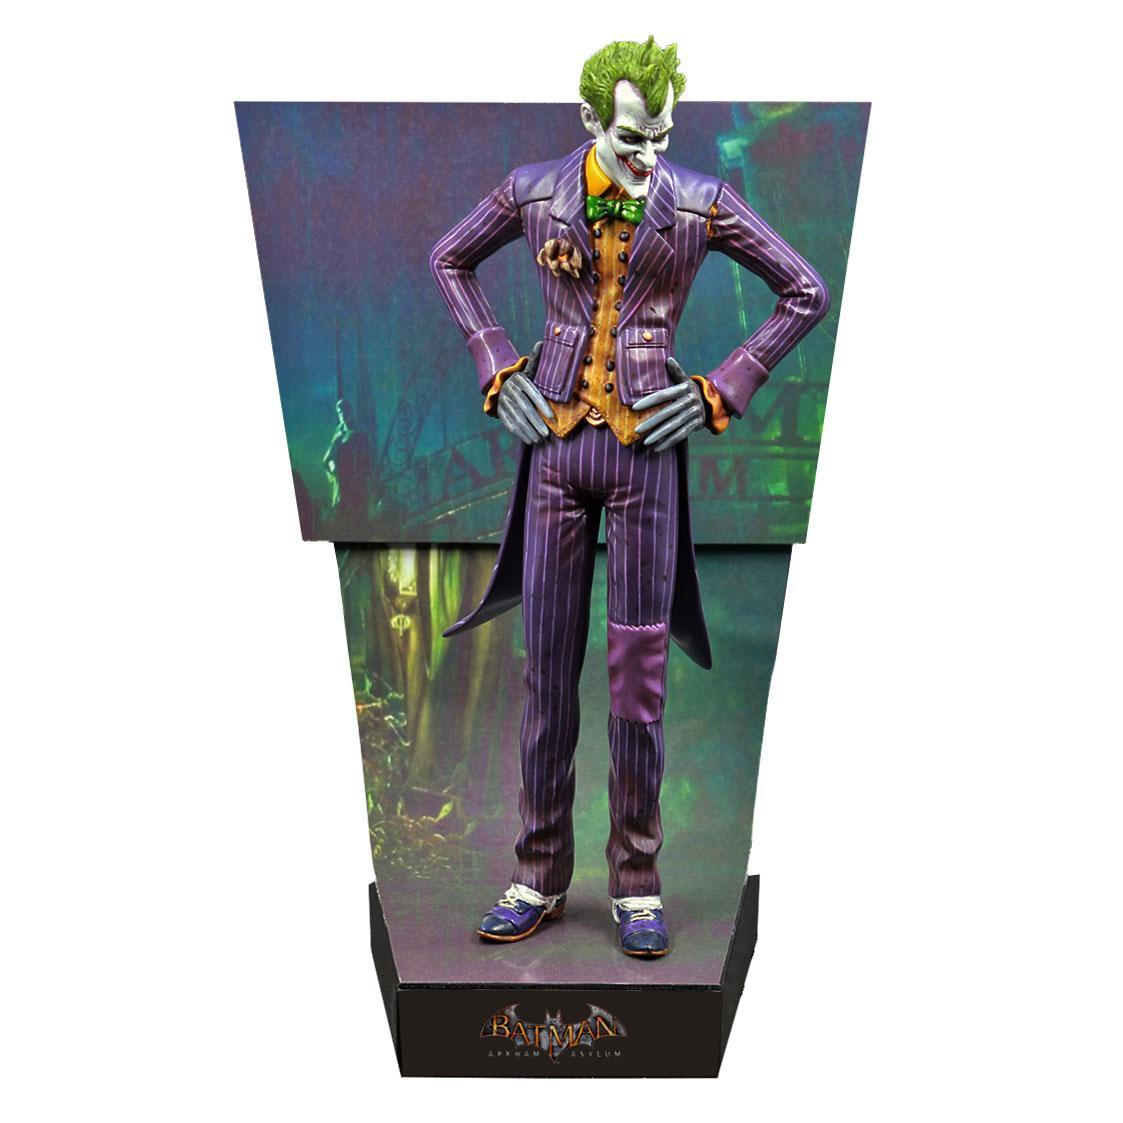 Batman Arkham Asylum Premium Motion Statue The Joker 25 cm